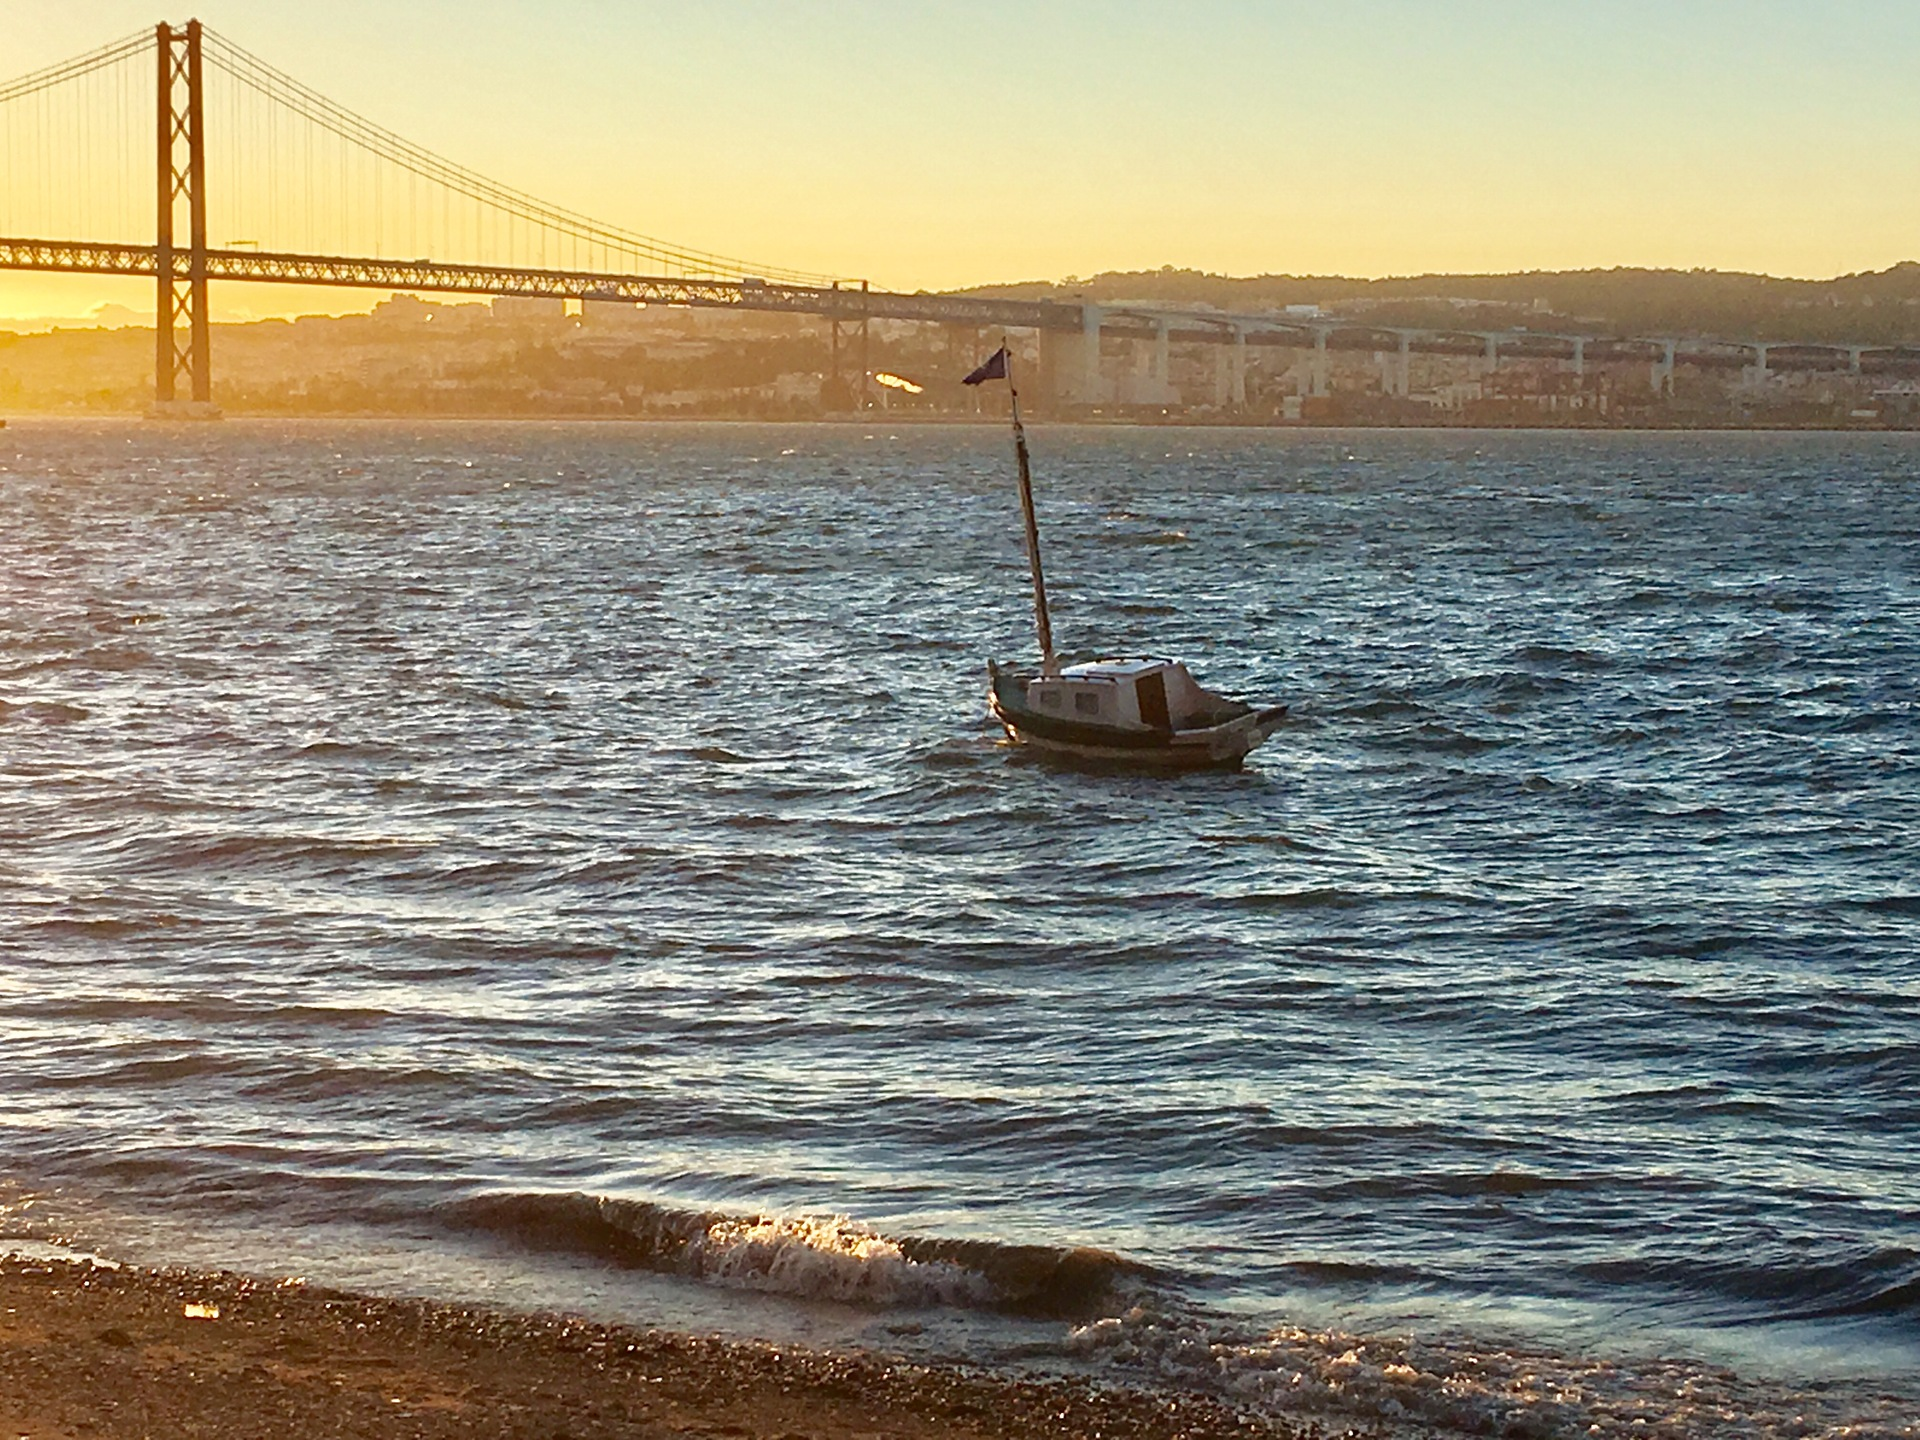 Little boat, big bridge